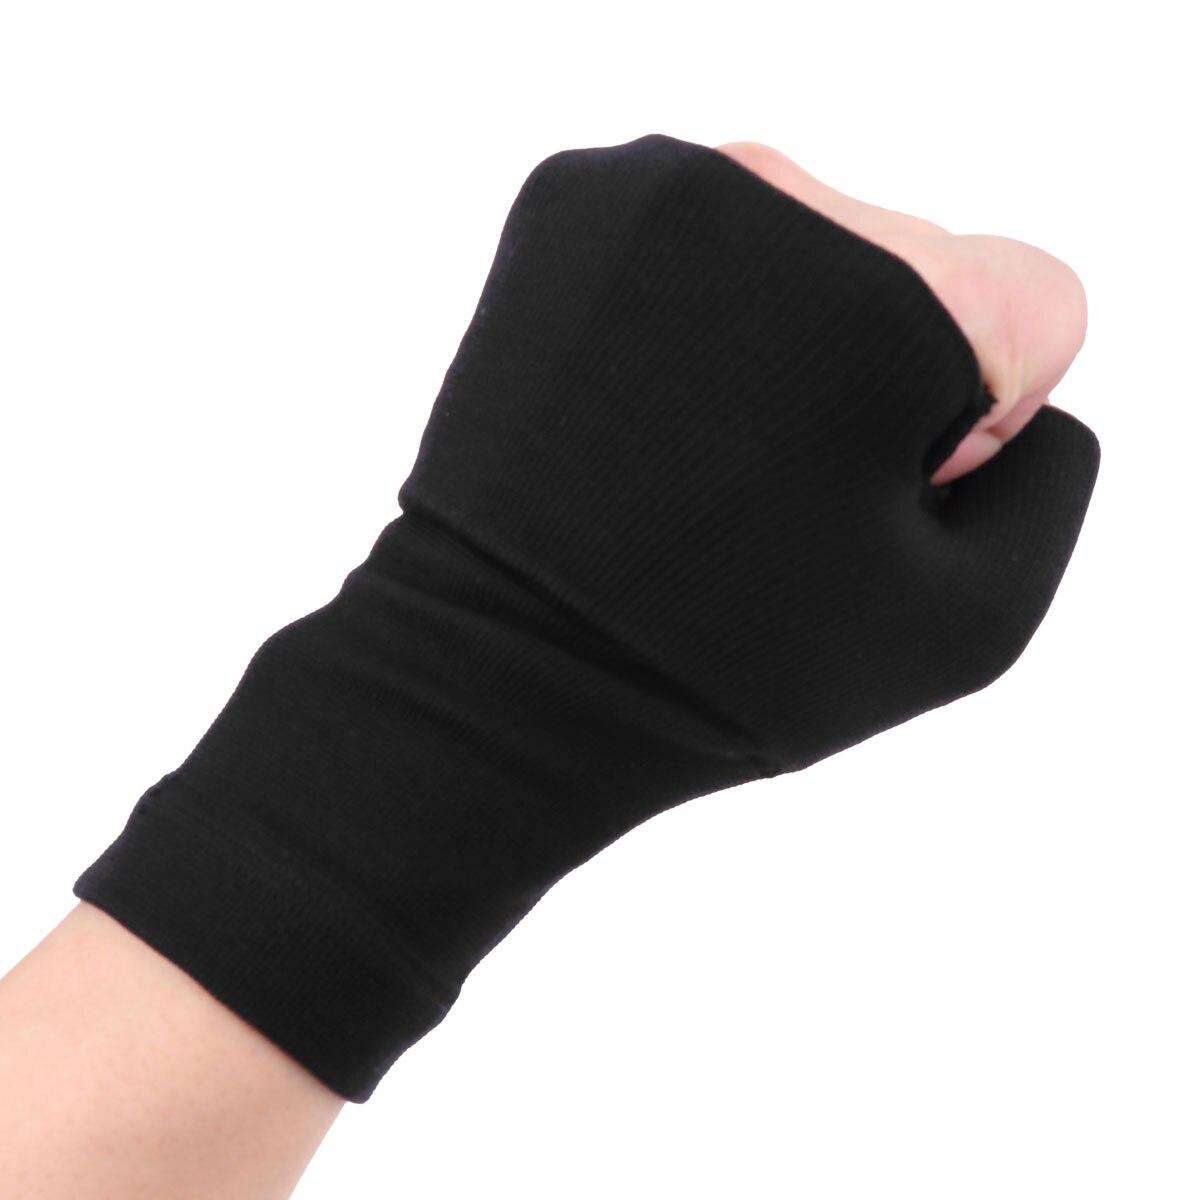 1 Paar Handgelenk Unterstützung Kompression Halbe Handschuhe Handgelenk Schutz Arthritis Brace Sleeve Medizinische Elastische Palm Hand Fitness Hülse Wrap